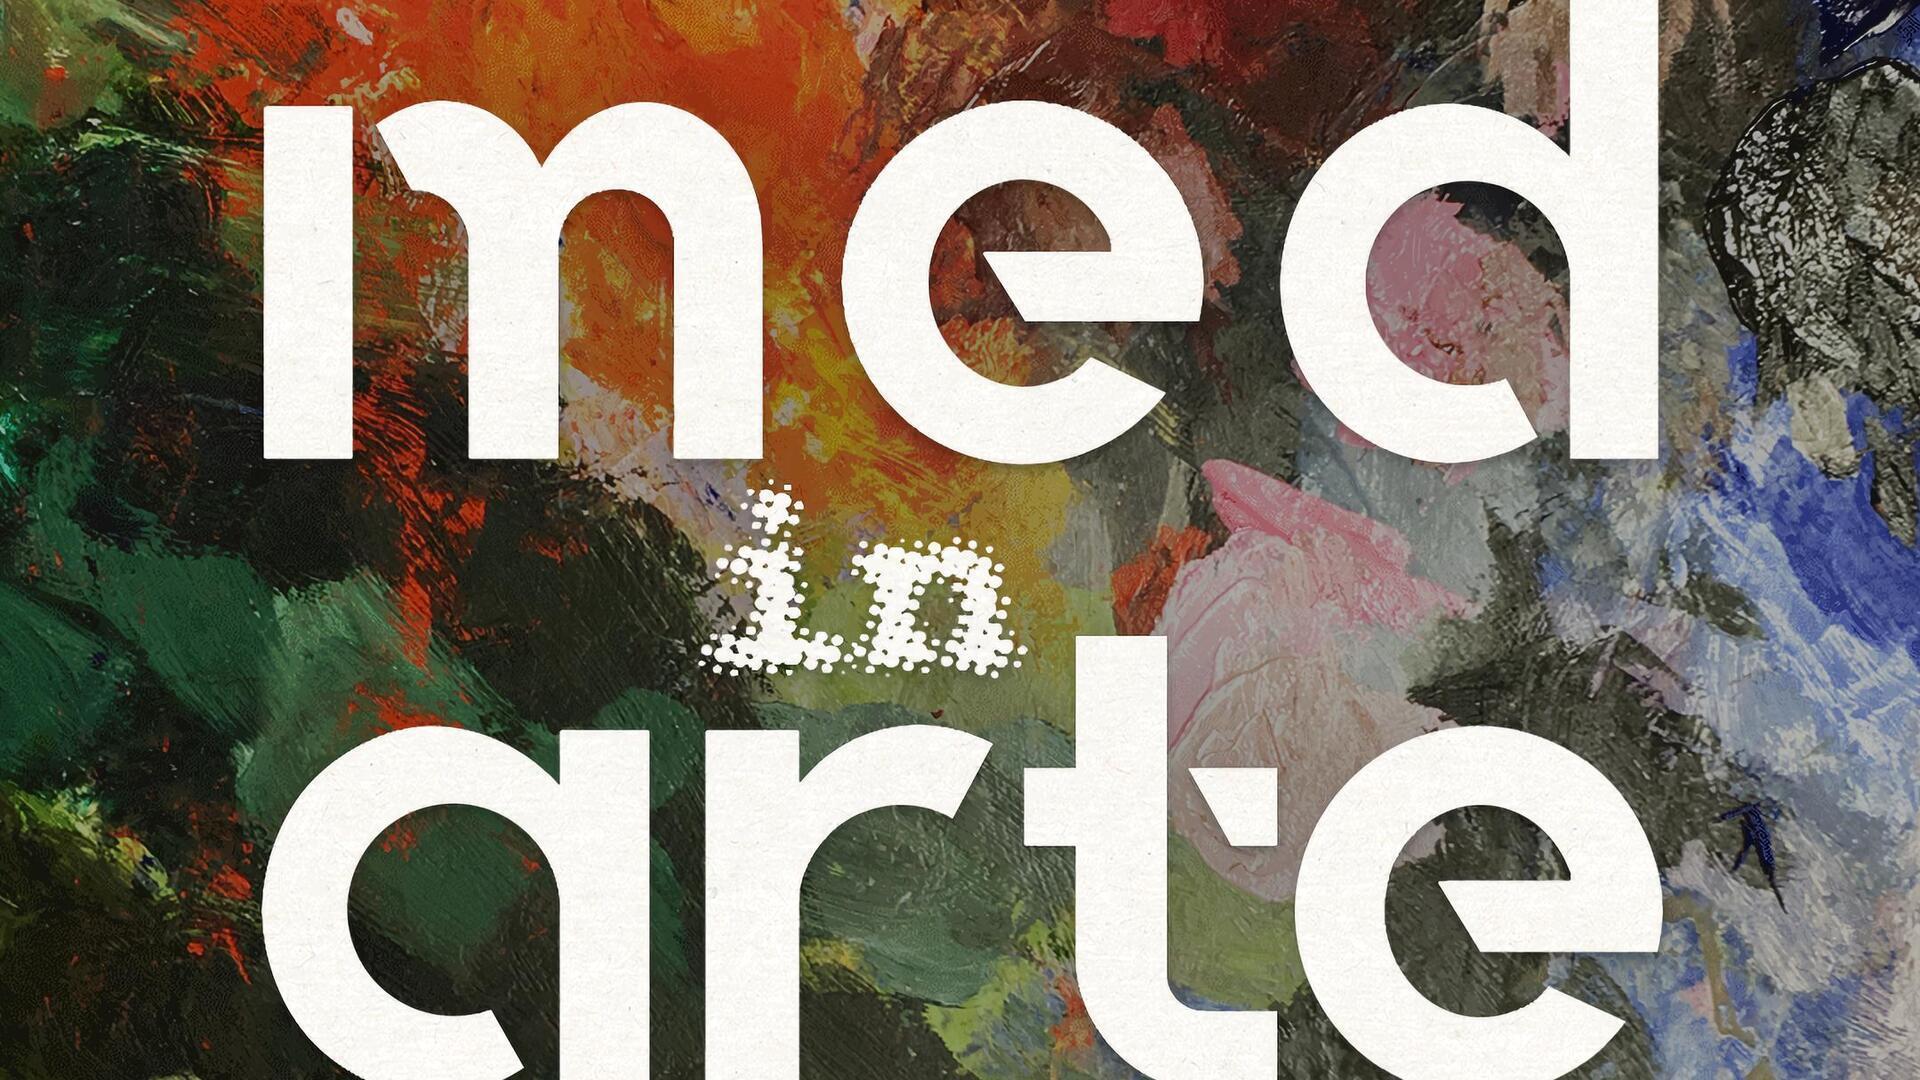 Med In Arte : Toni Casalonga